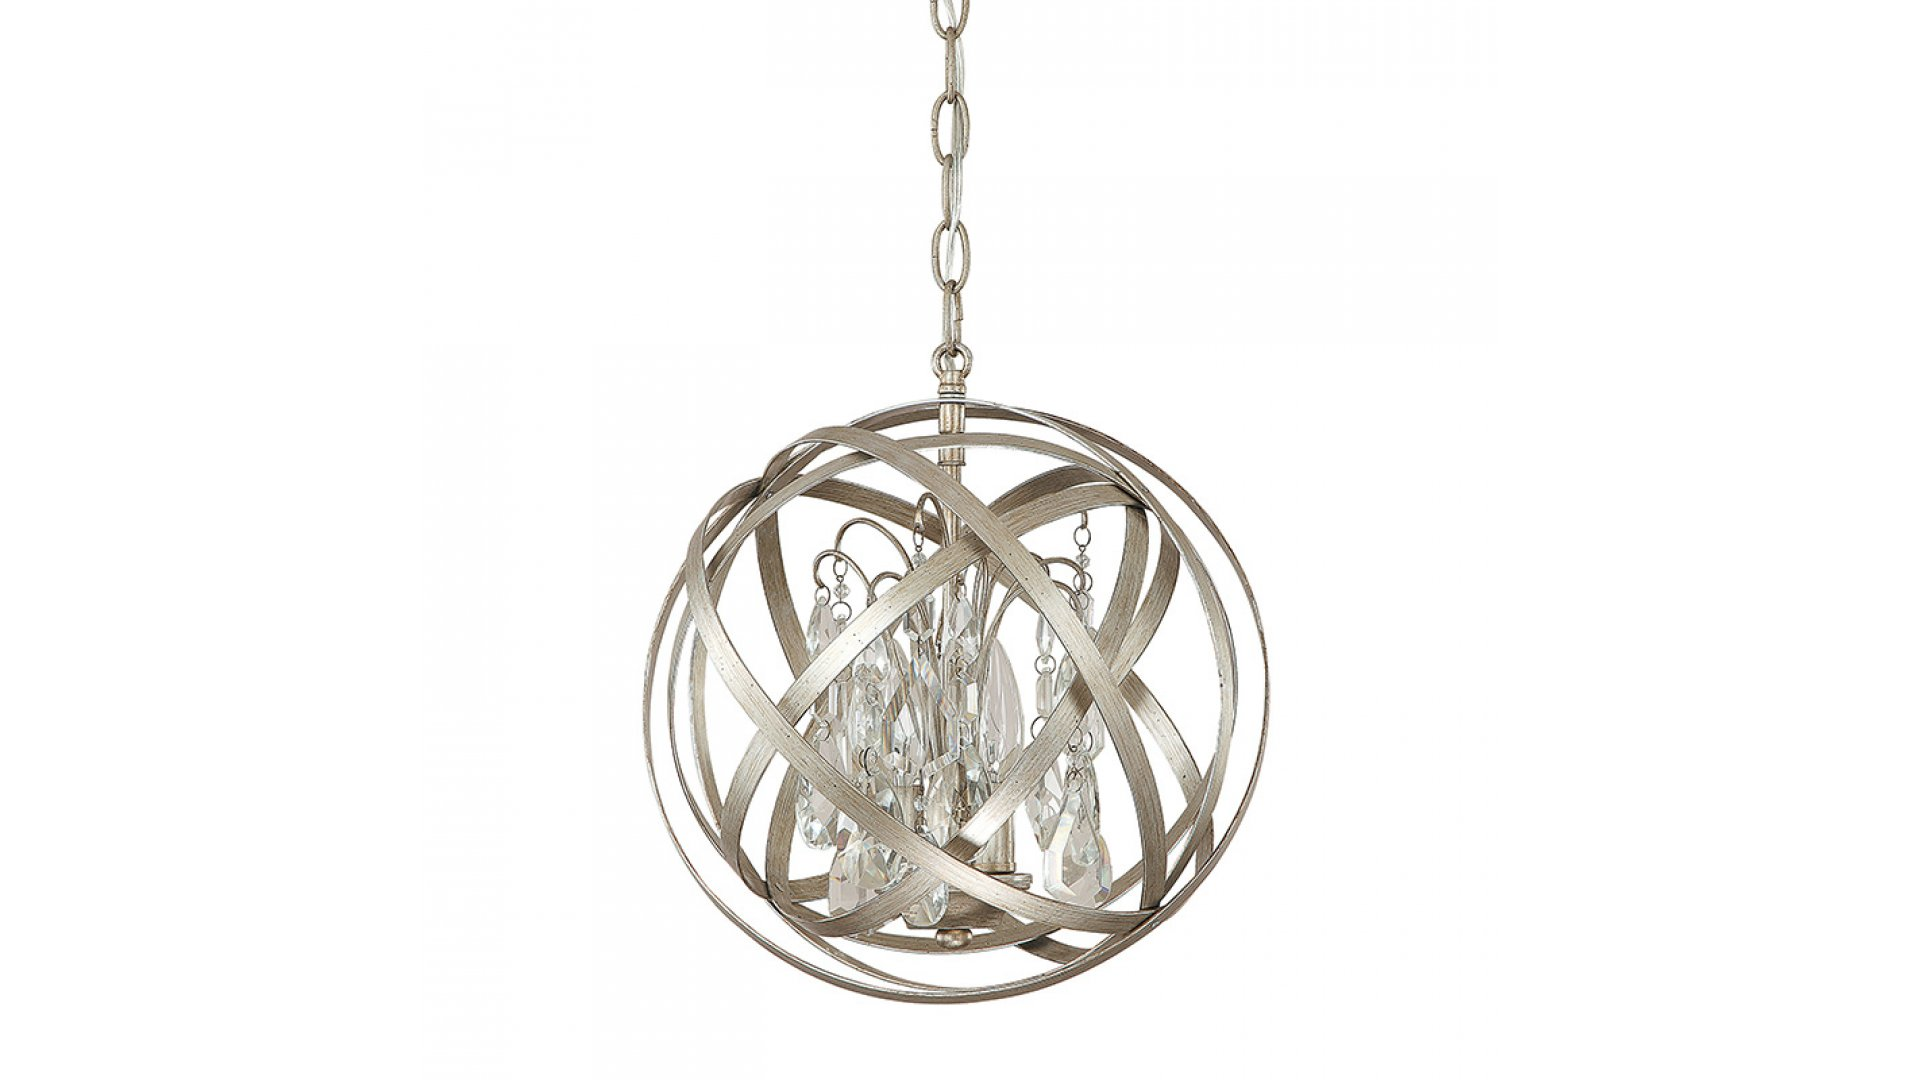 Capital Lighting 4233rs Cr Axis Crystal 12 Inch Pendant